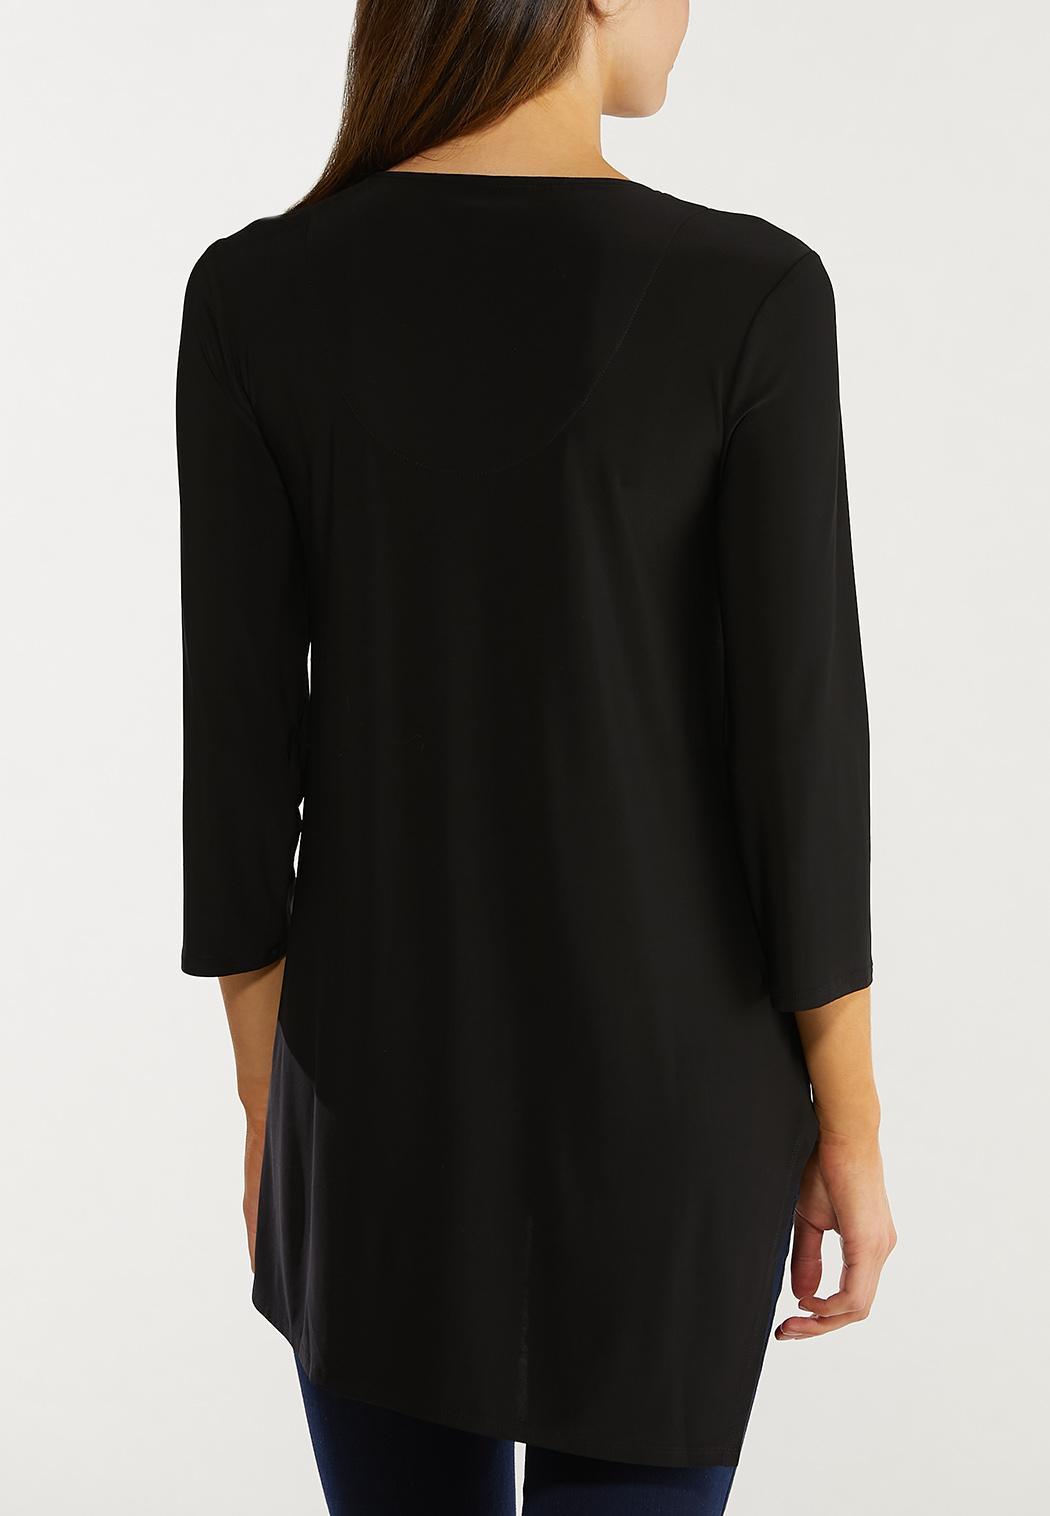 Plus Size Dressy Asymmetrical Top (Item #44579327)